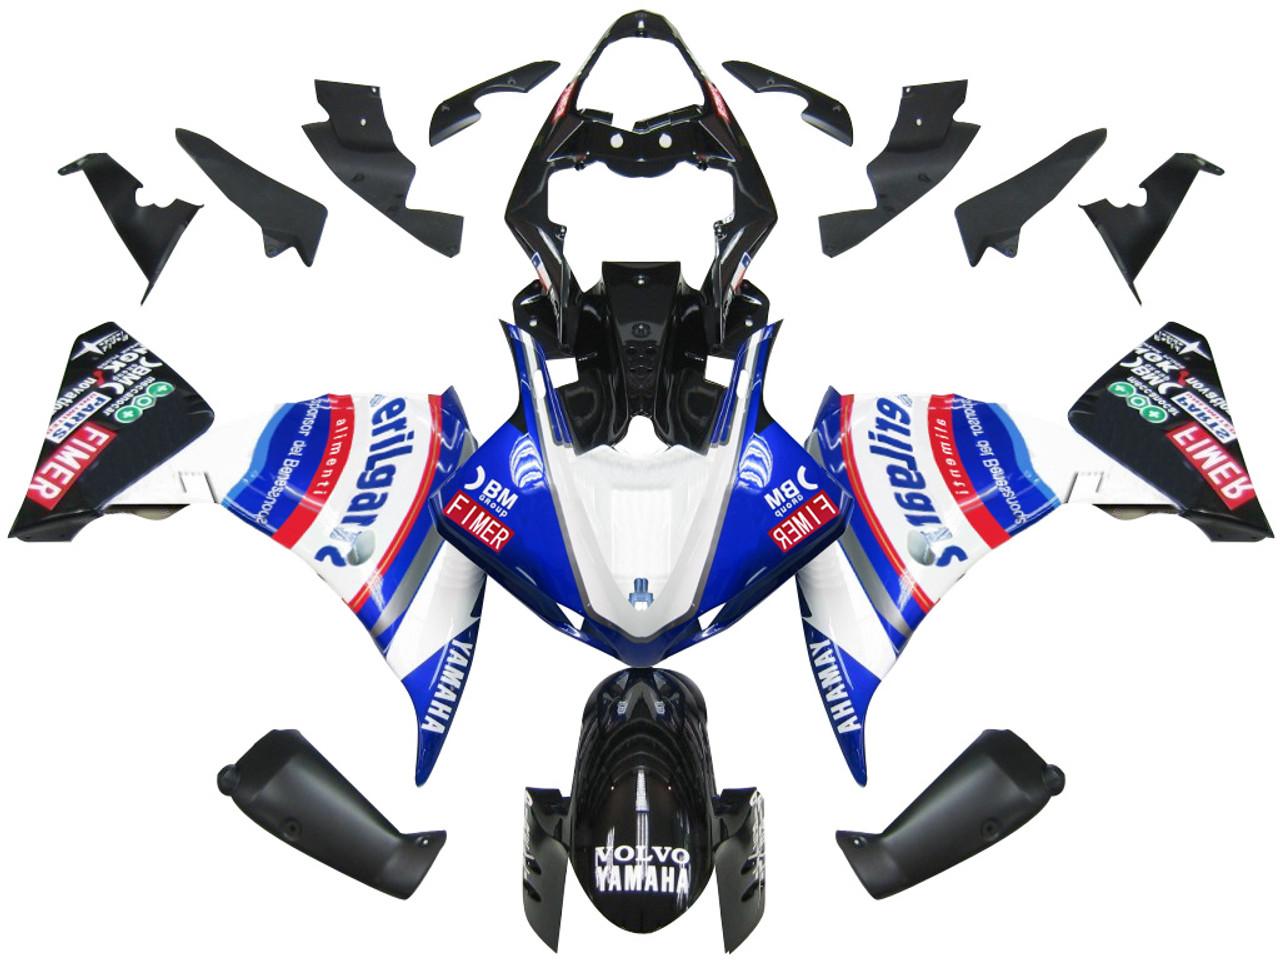 Fairings Yamaha YZF-R1 Blue White Sterilgard Racing (2009-2012)